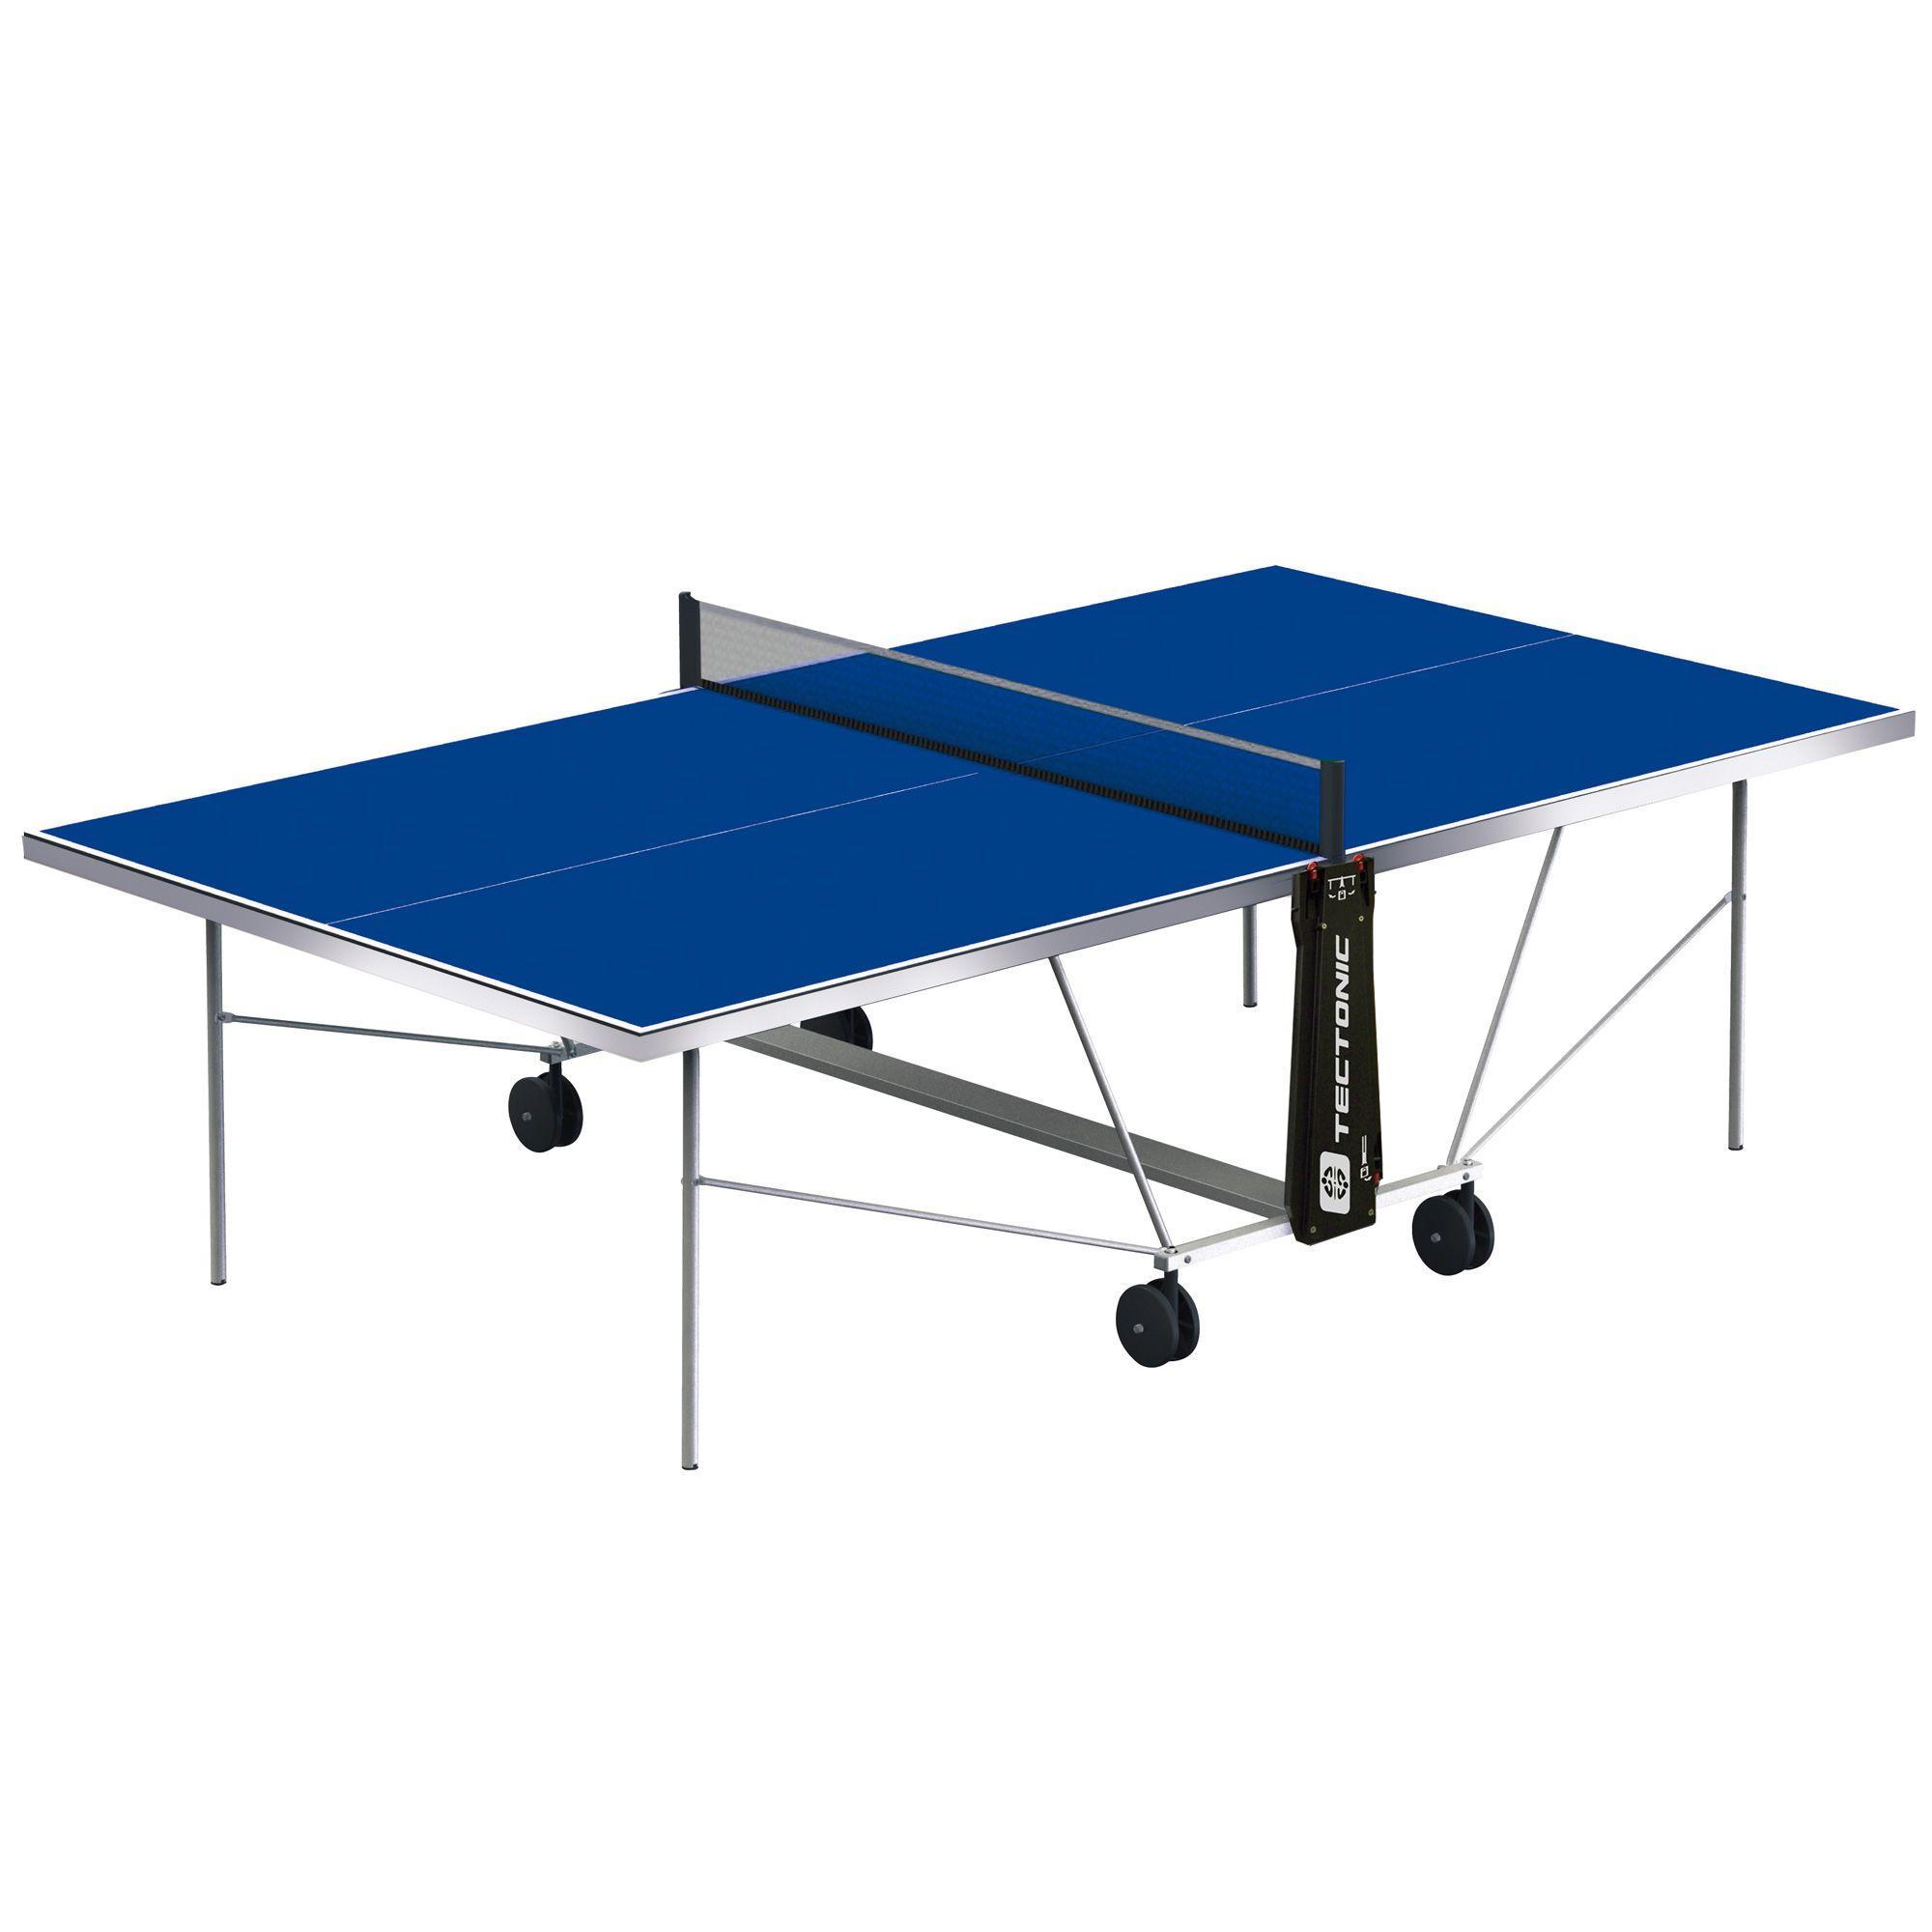 Cornilleau tectonic tecto 50 rollaway outdoor table tennis - Weatherproof table tennis table ...